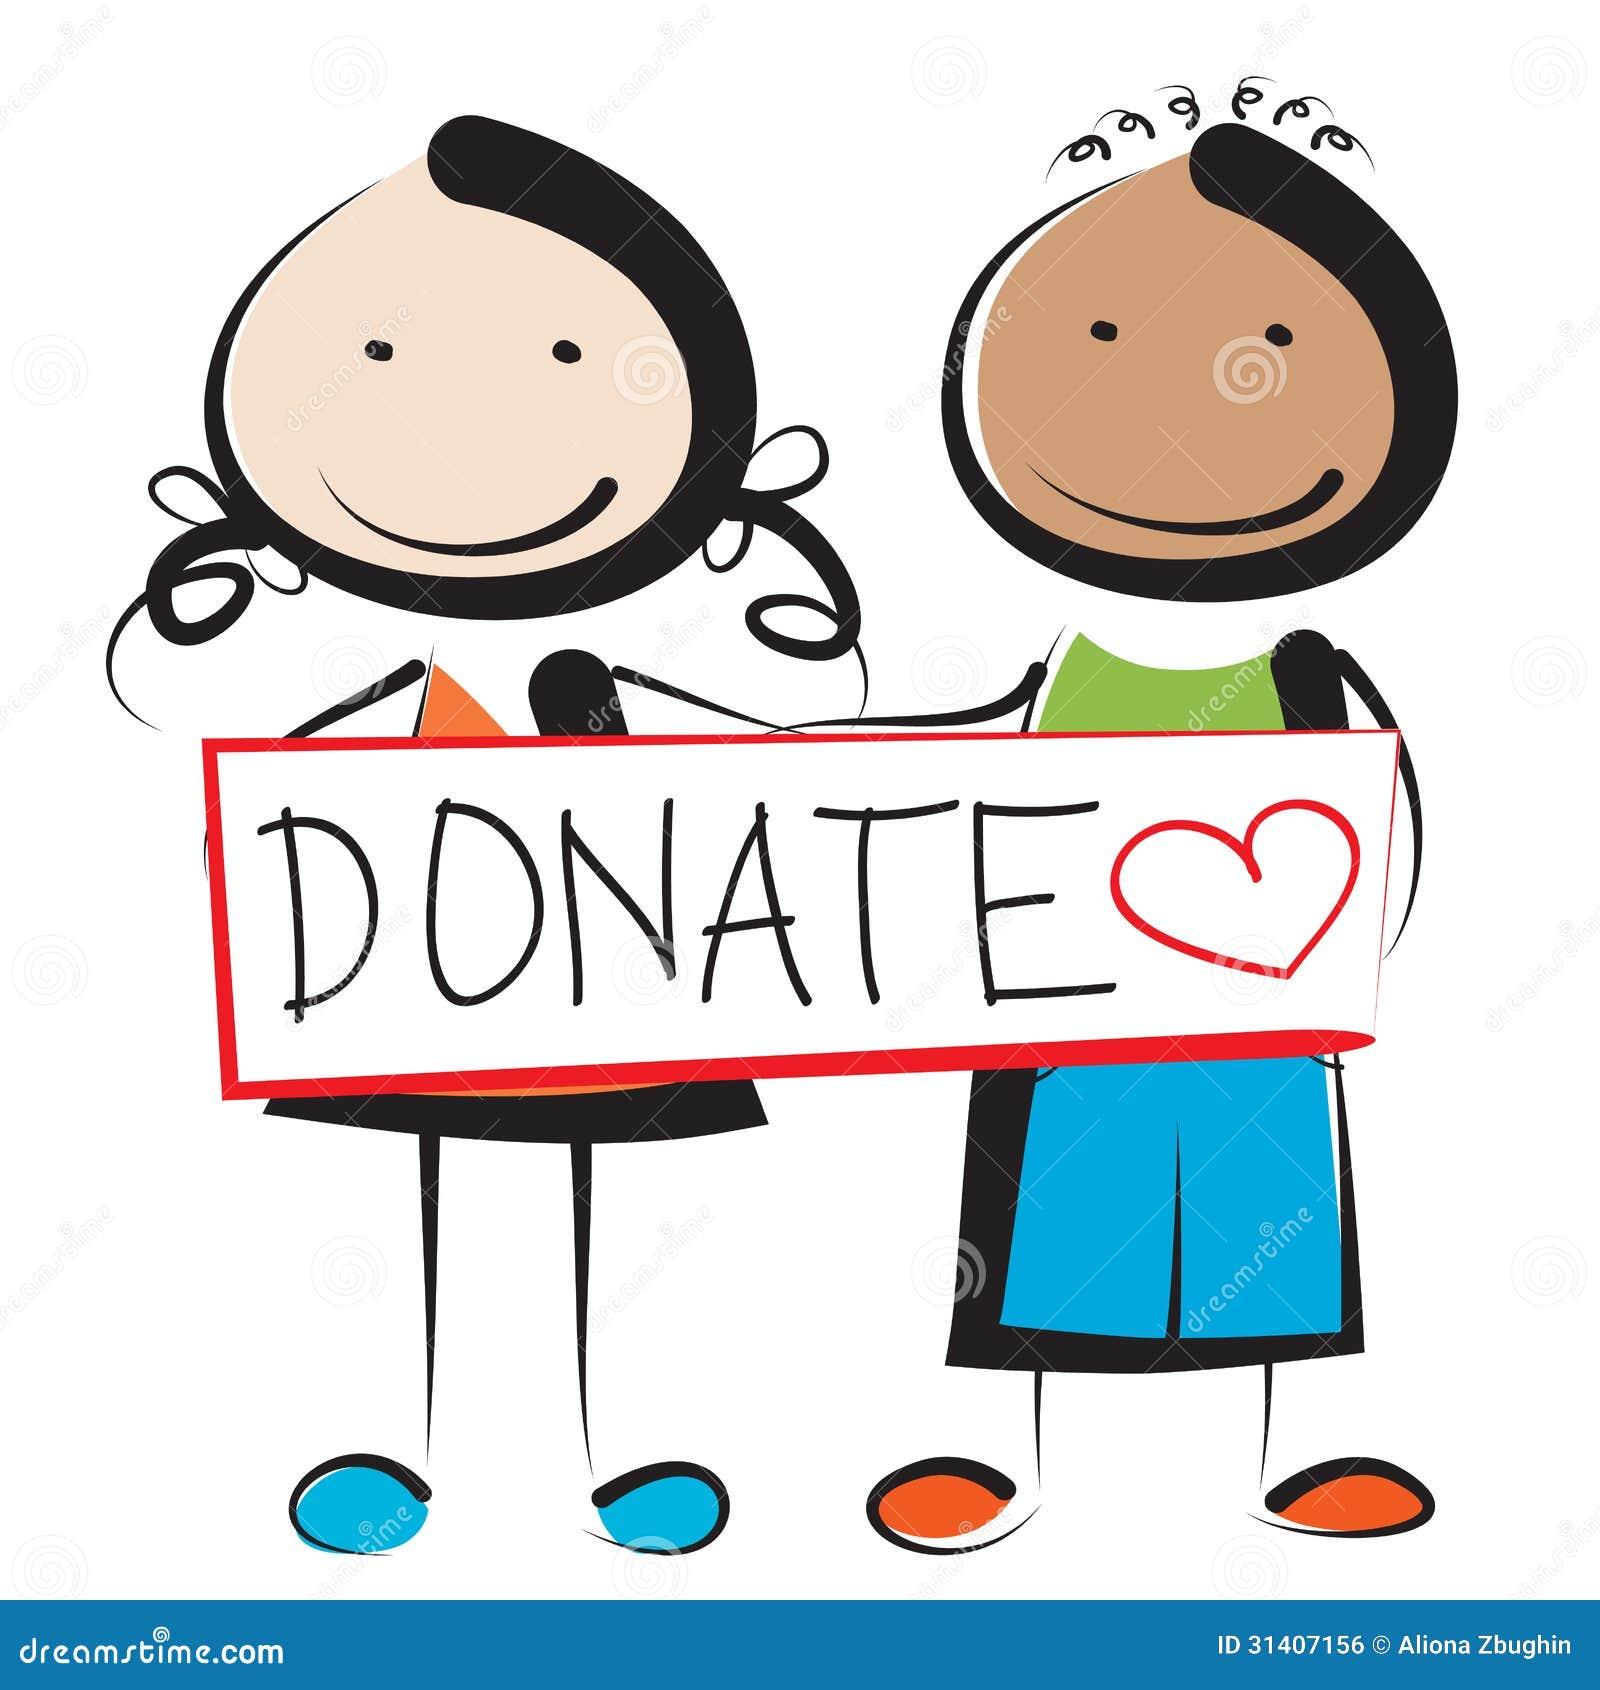 Donate Royalty Free Stock Image - Image: 31407156